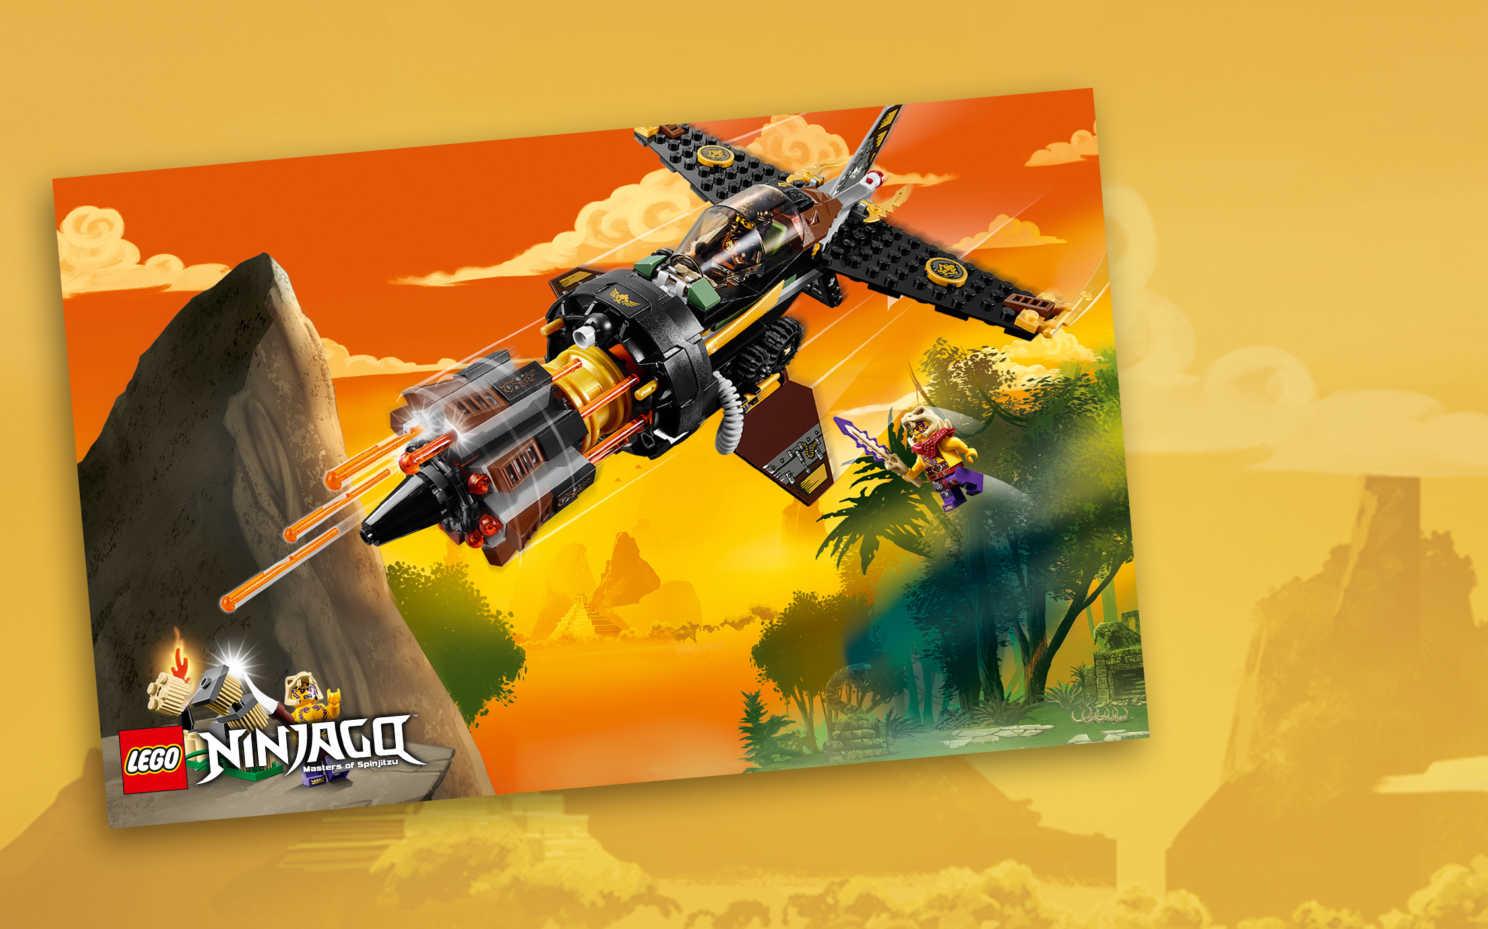 70747   Wallpaper   Activities   Ninjago LEGOcom 1488x929